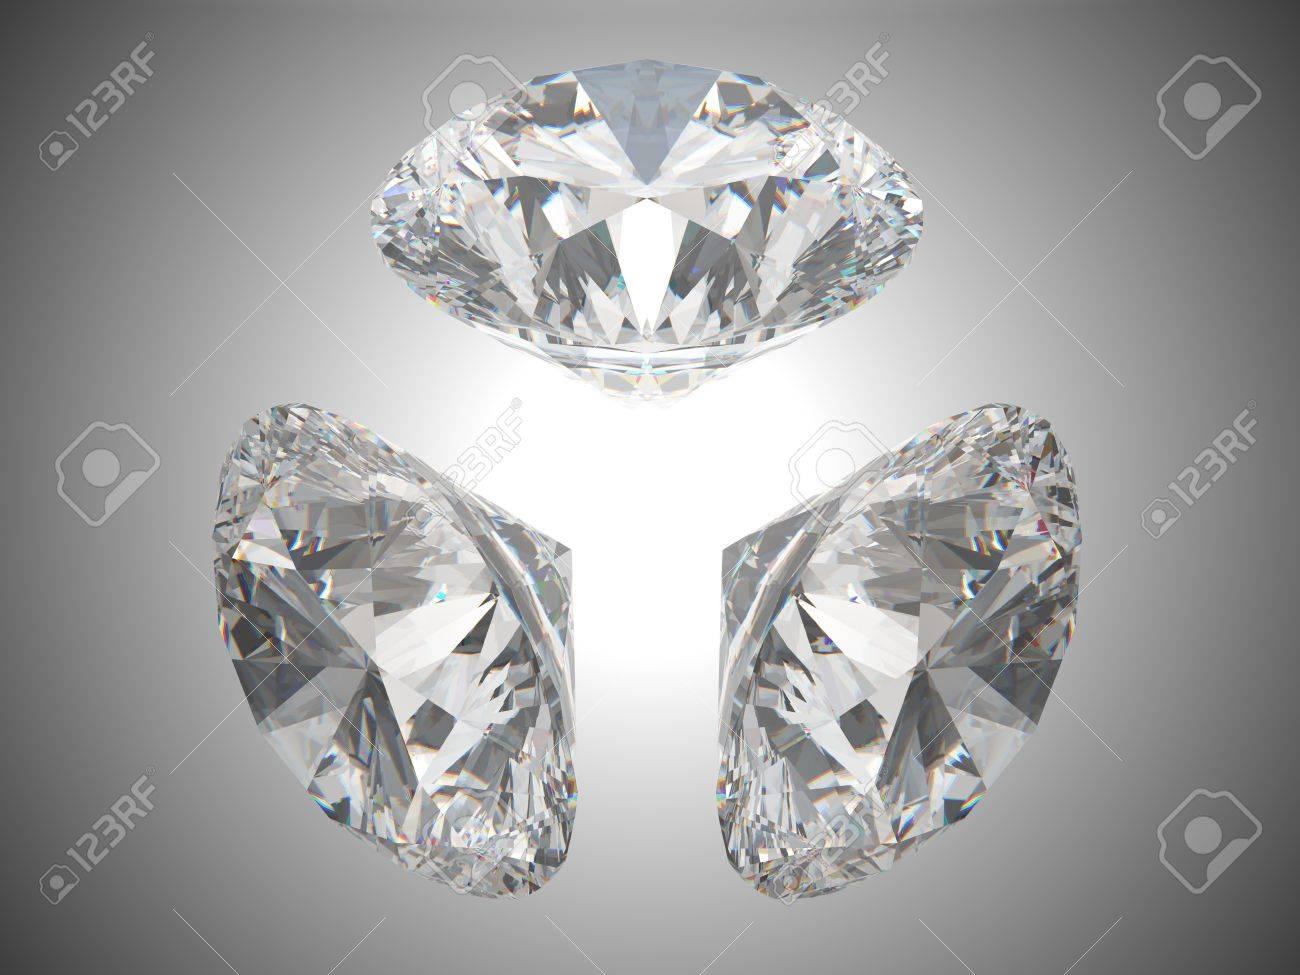 Three brilliant cut diamonds or gems. Over grey background Stock Photo - 8183448